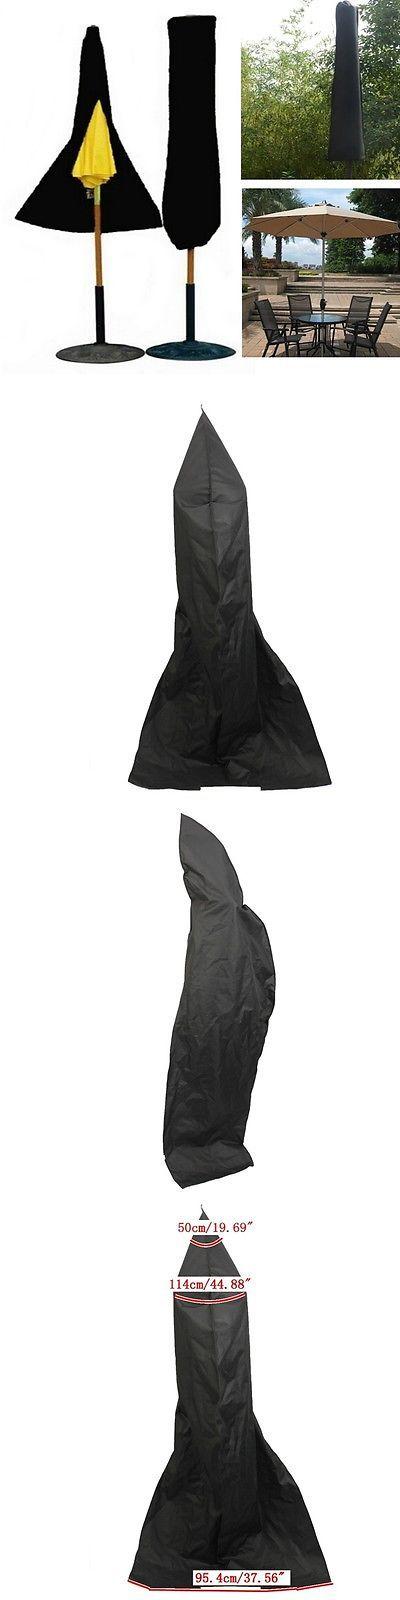 Map Covers 181402: Outdoor Yard Garden Umbrella Parasol Cover Zipper Waterproof -> BUY IT NOW ONLY: $53.97 on eBay!